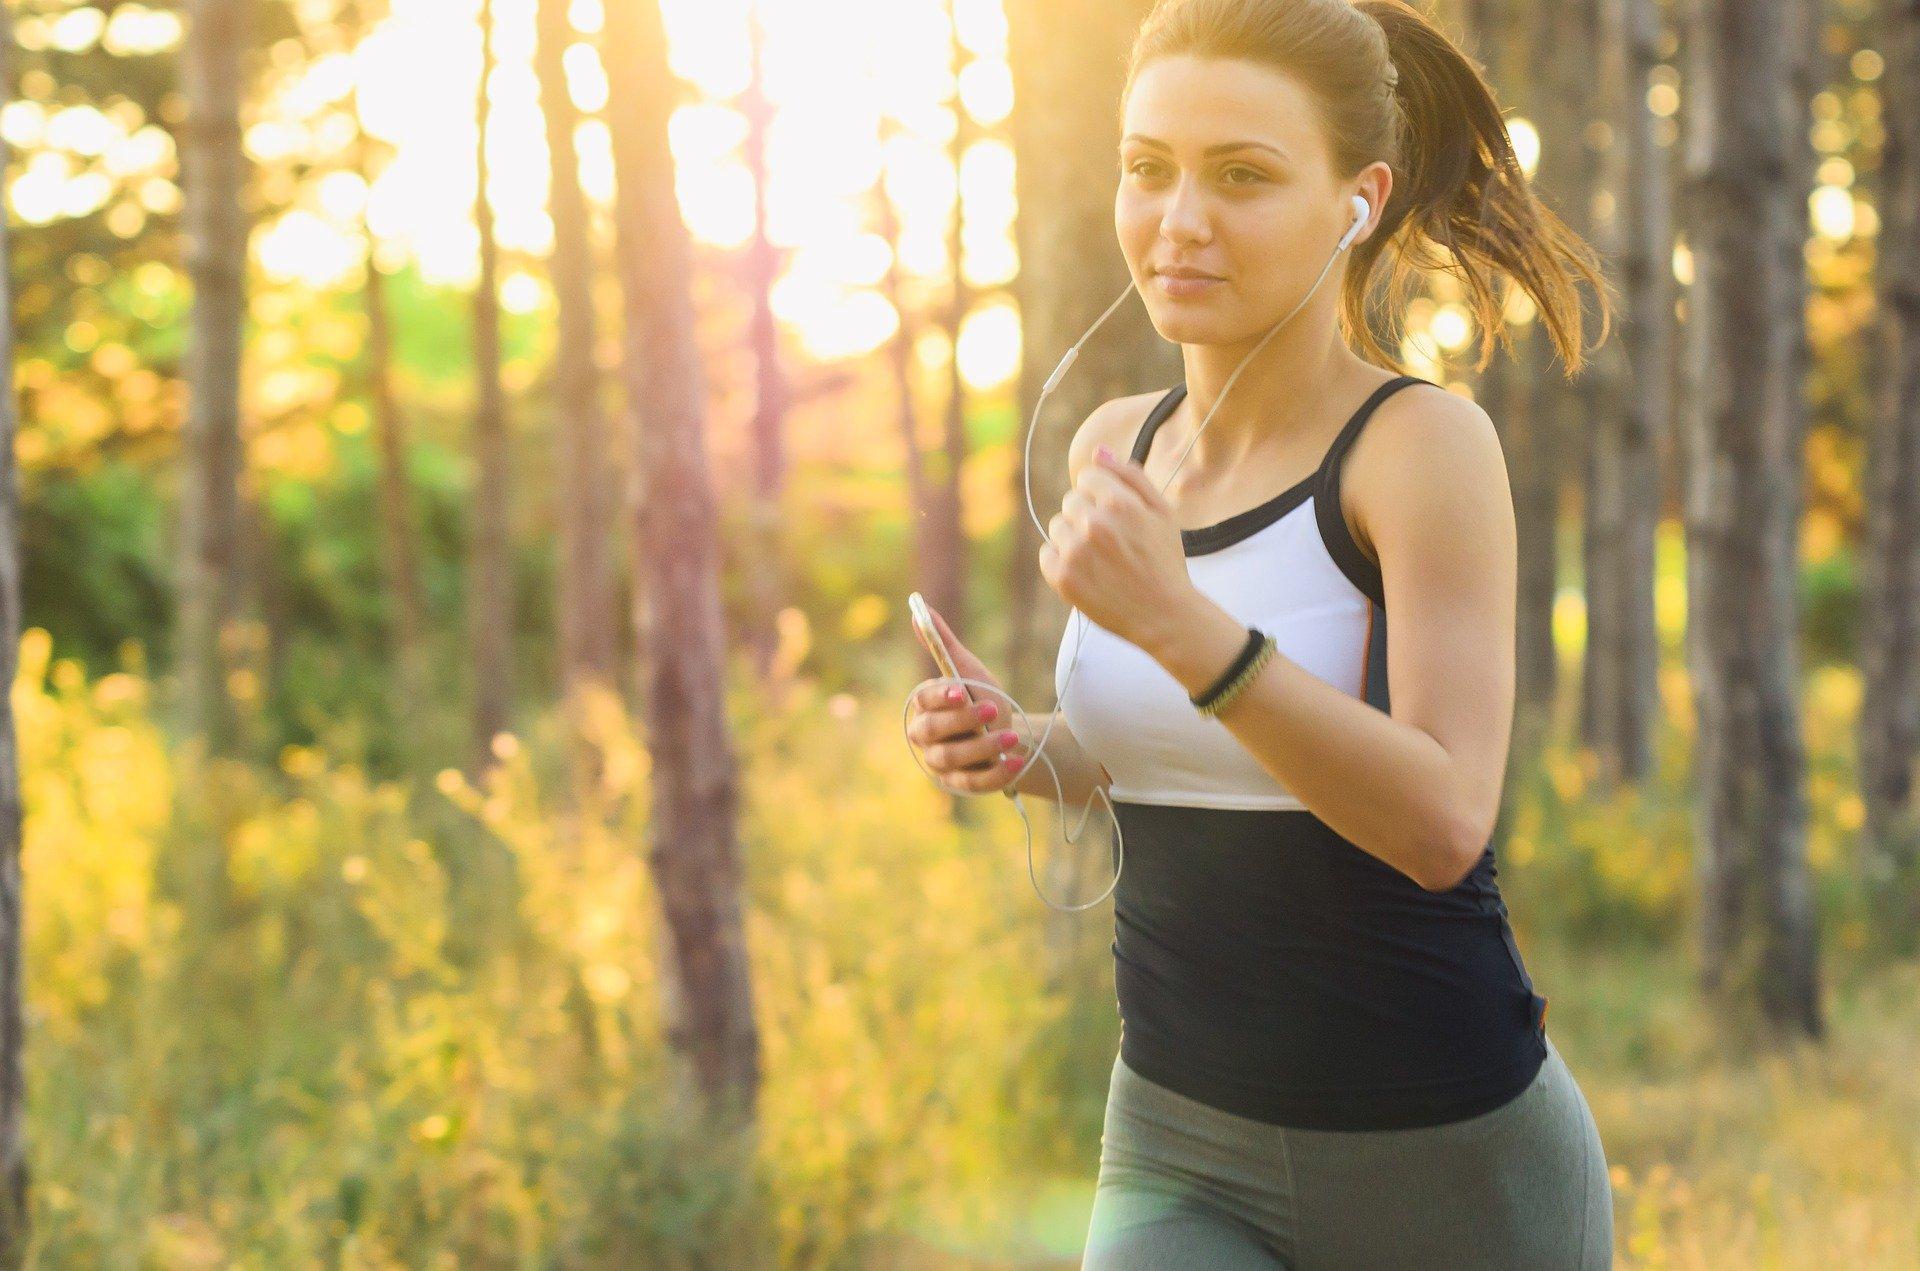 Desafiar os nossos limites: sinónimo de saúde?! - Desporto